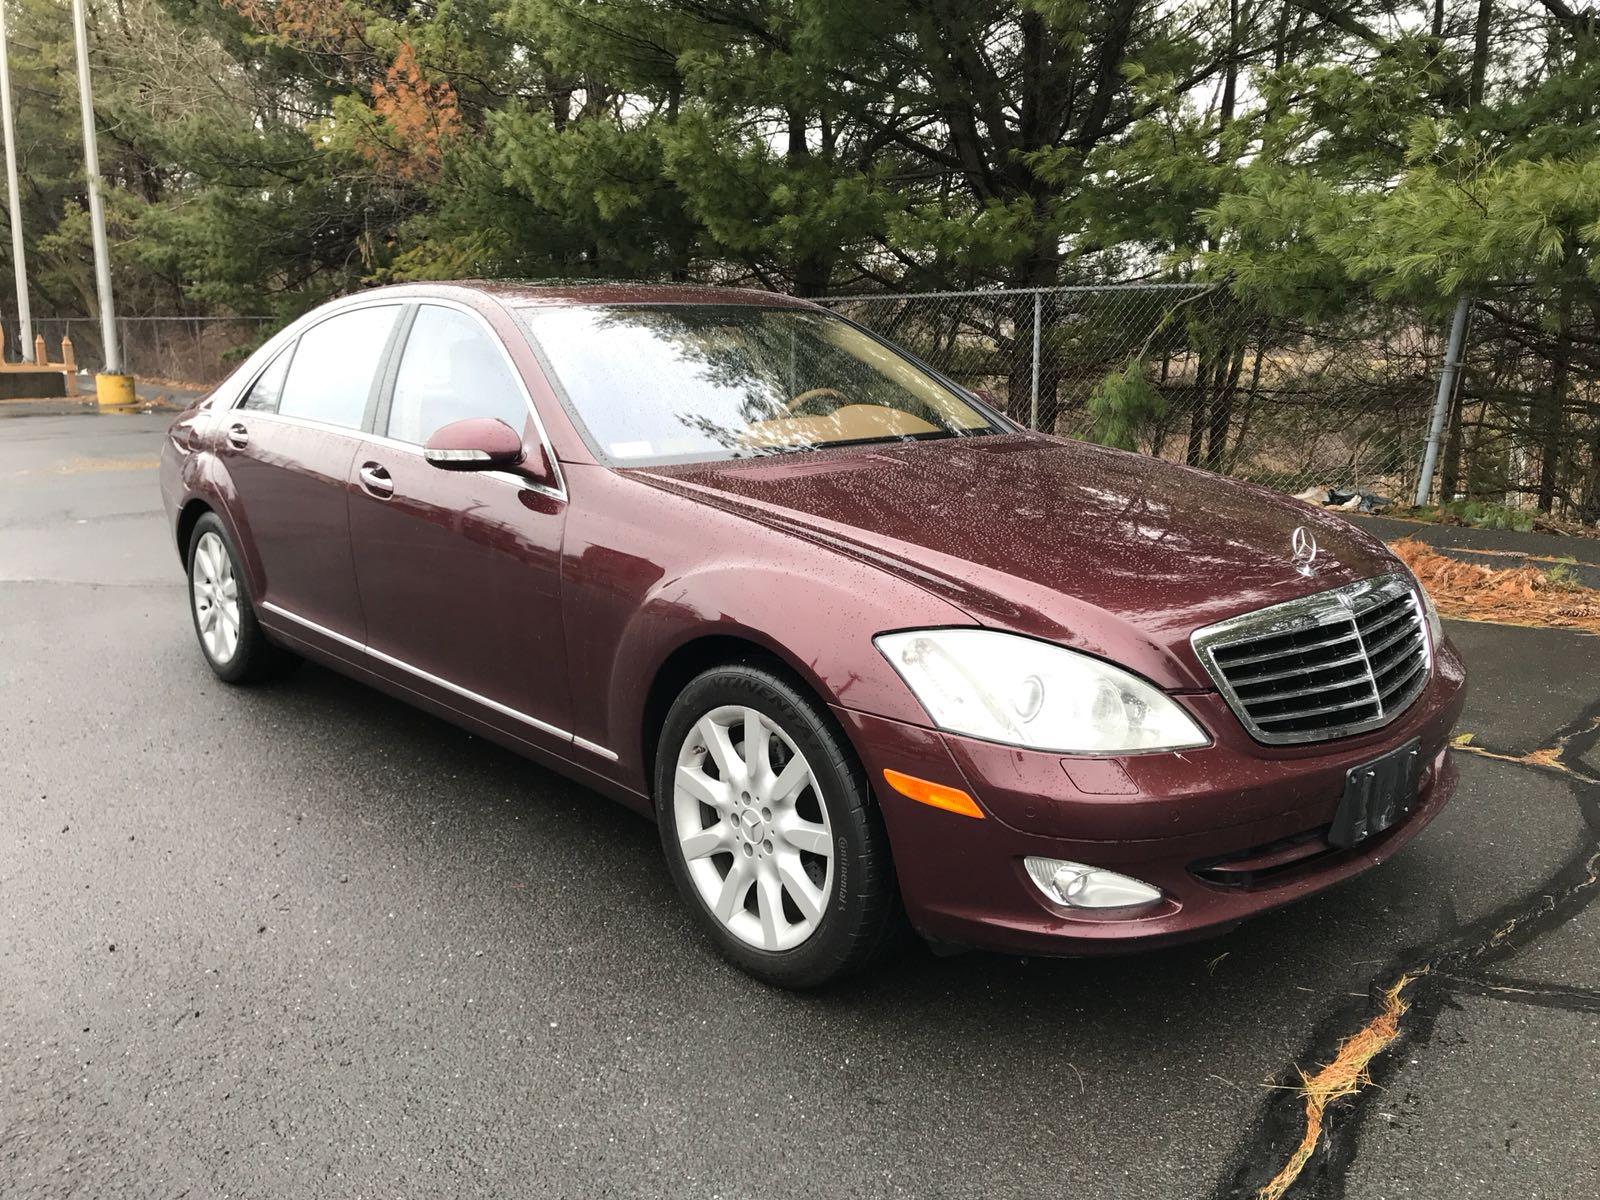 Auto Auction Ended On Vin Wdddj75x86a077186 2006 Mercedes Benz Cls 500 2007 S 550 55l